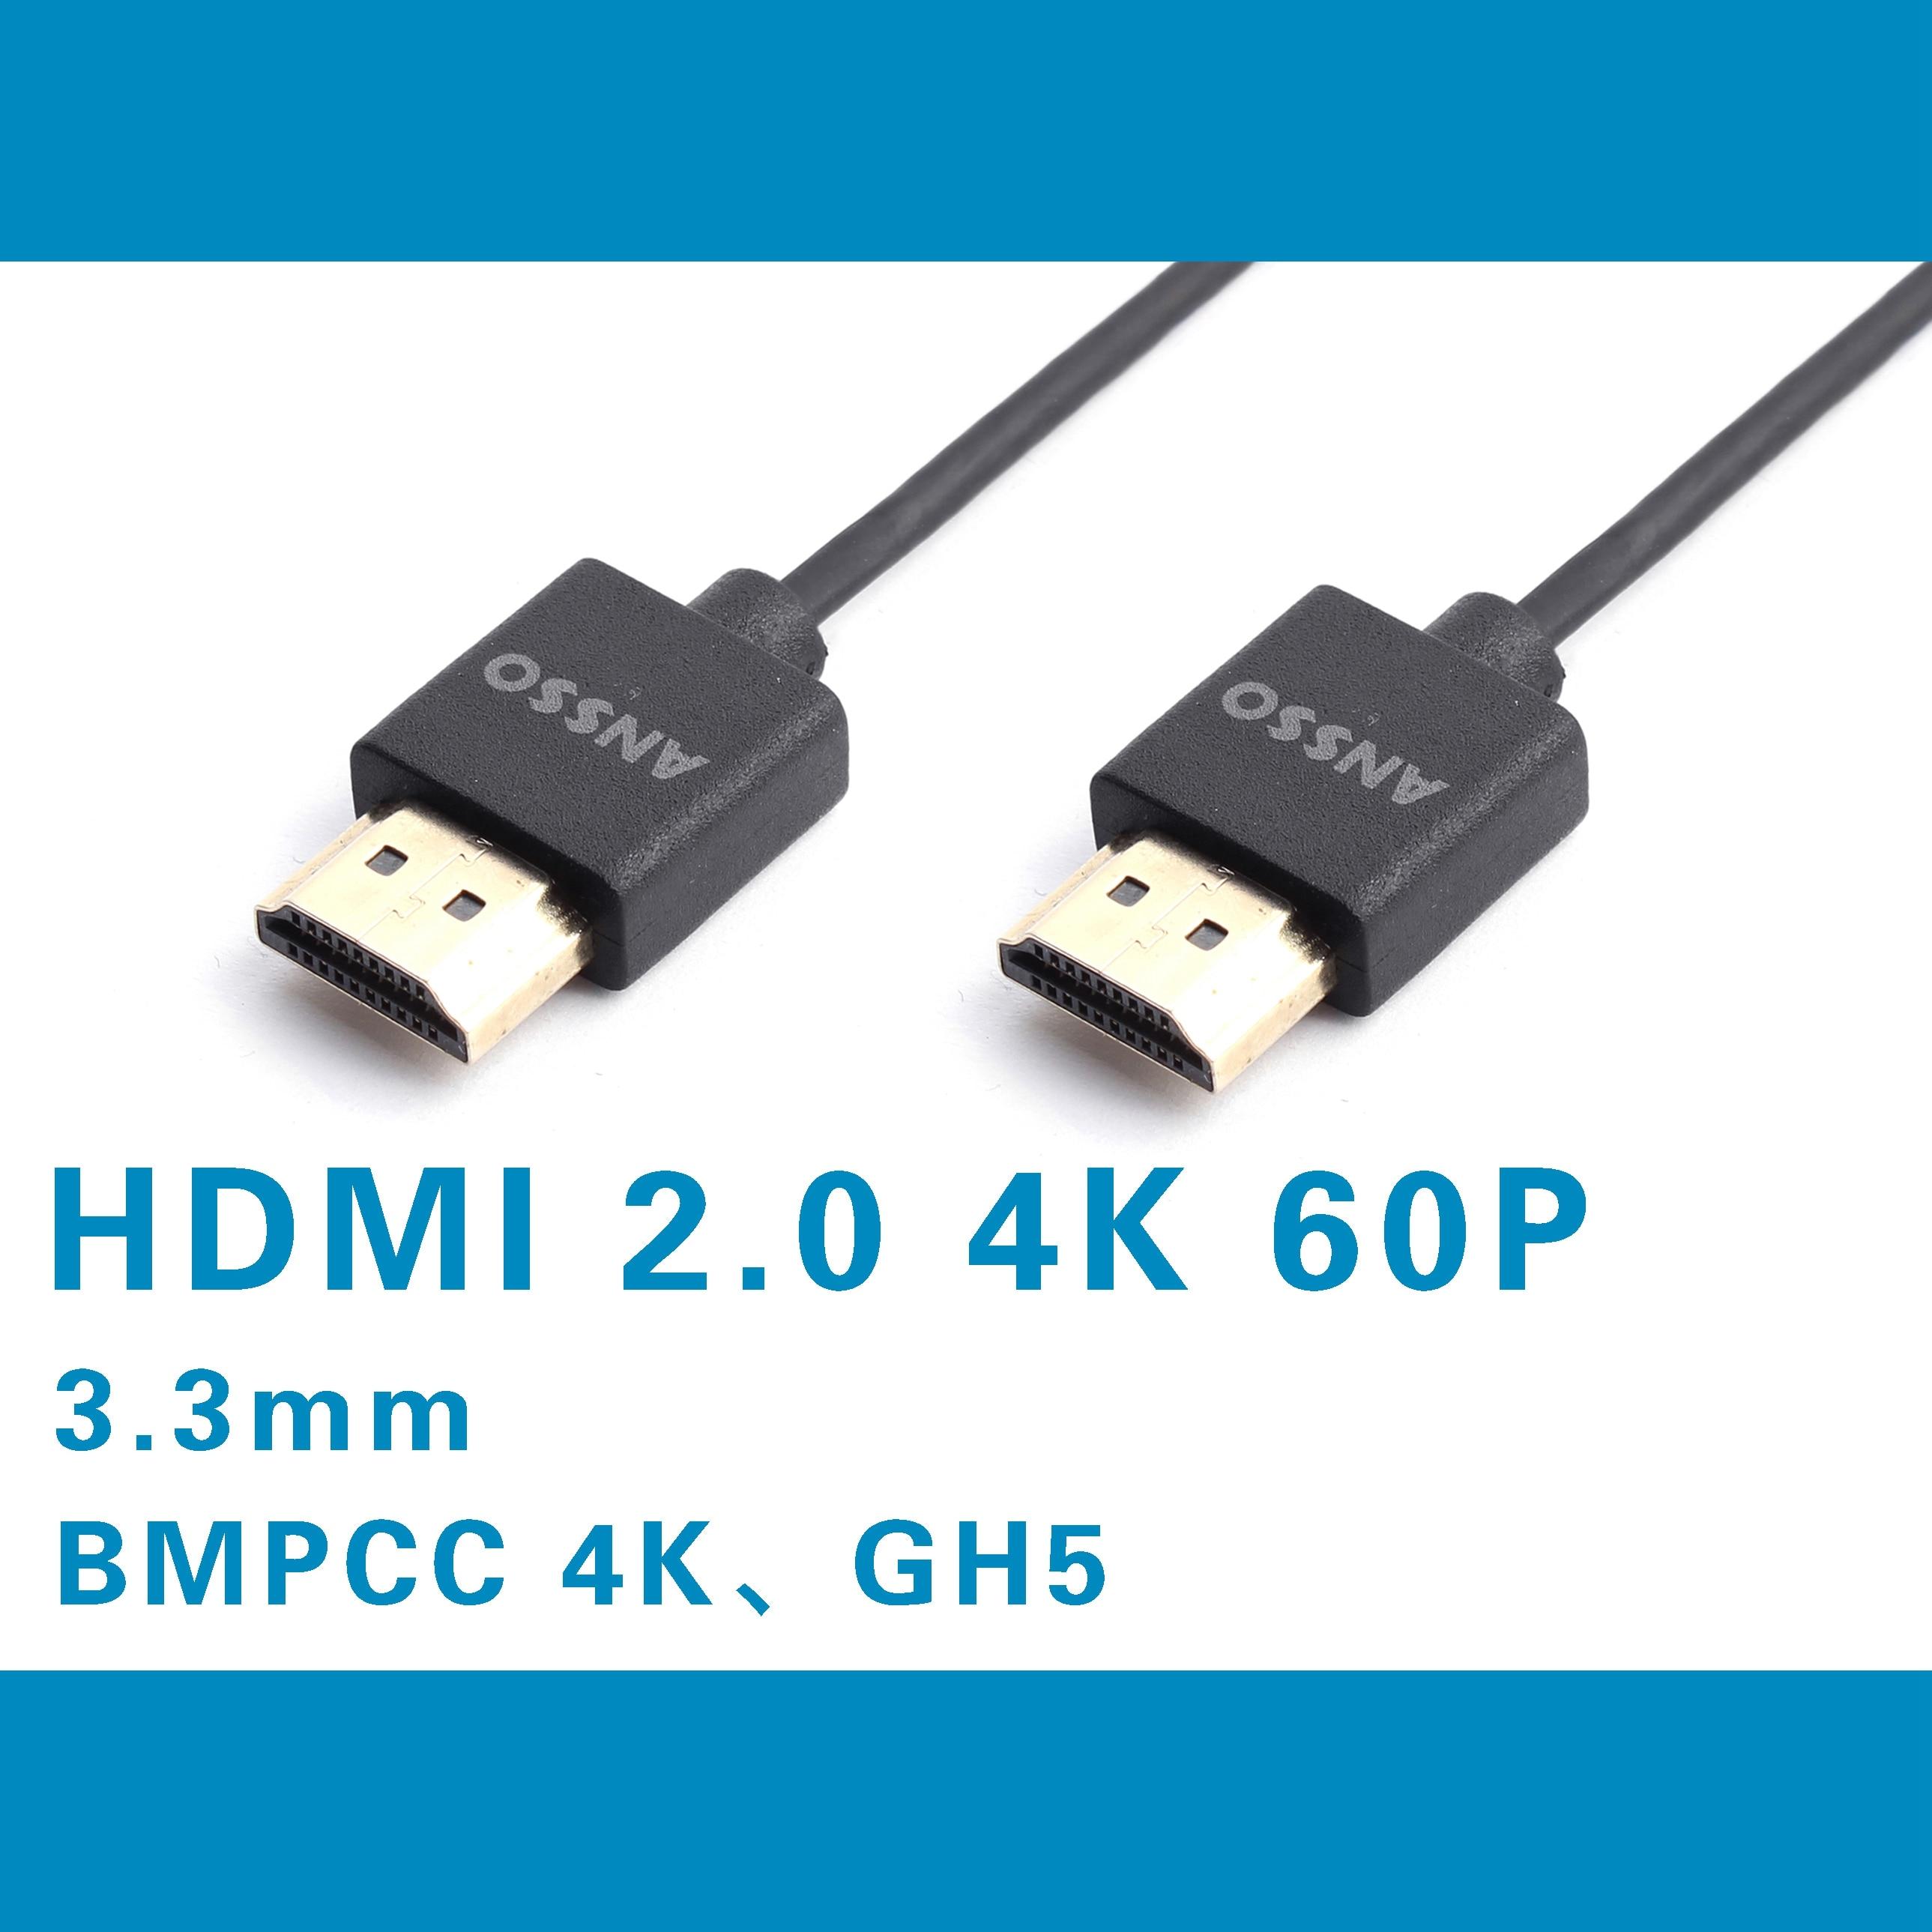 HDMI 2.0 vers HDMI 2.0 Super doux câble GH5 S S1H FS7 5 BMPCC 4K 60P Connexion moniteur enregistreur 18gbps; signal HDR Ultra Mince